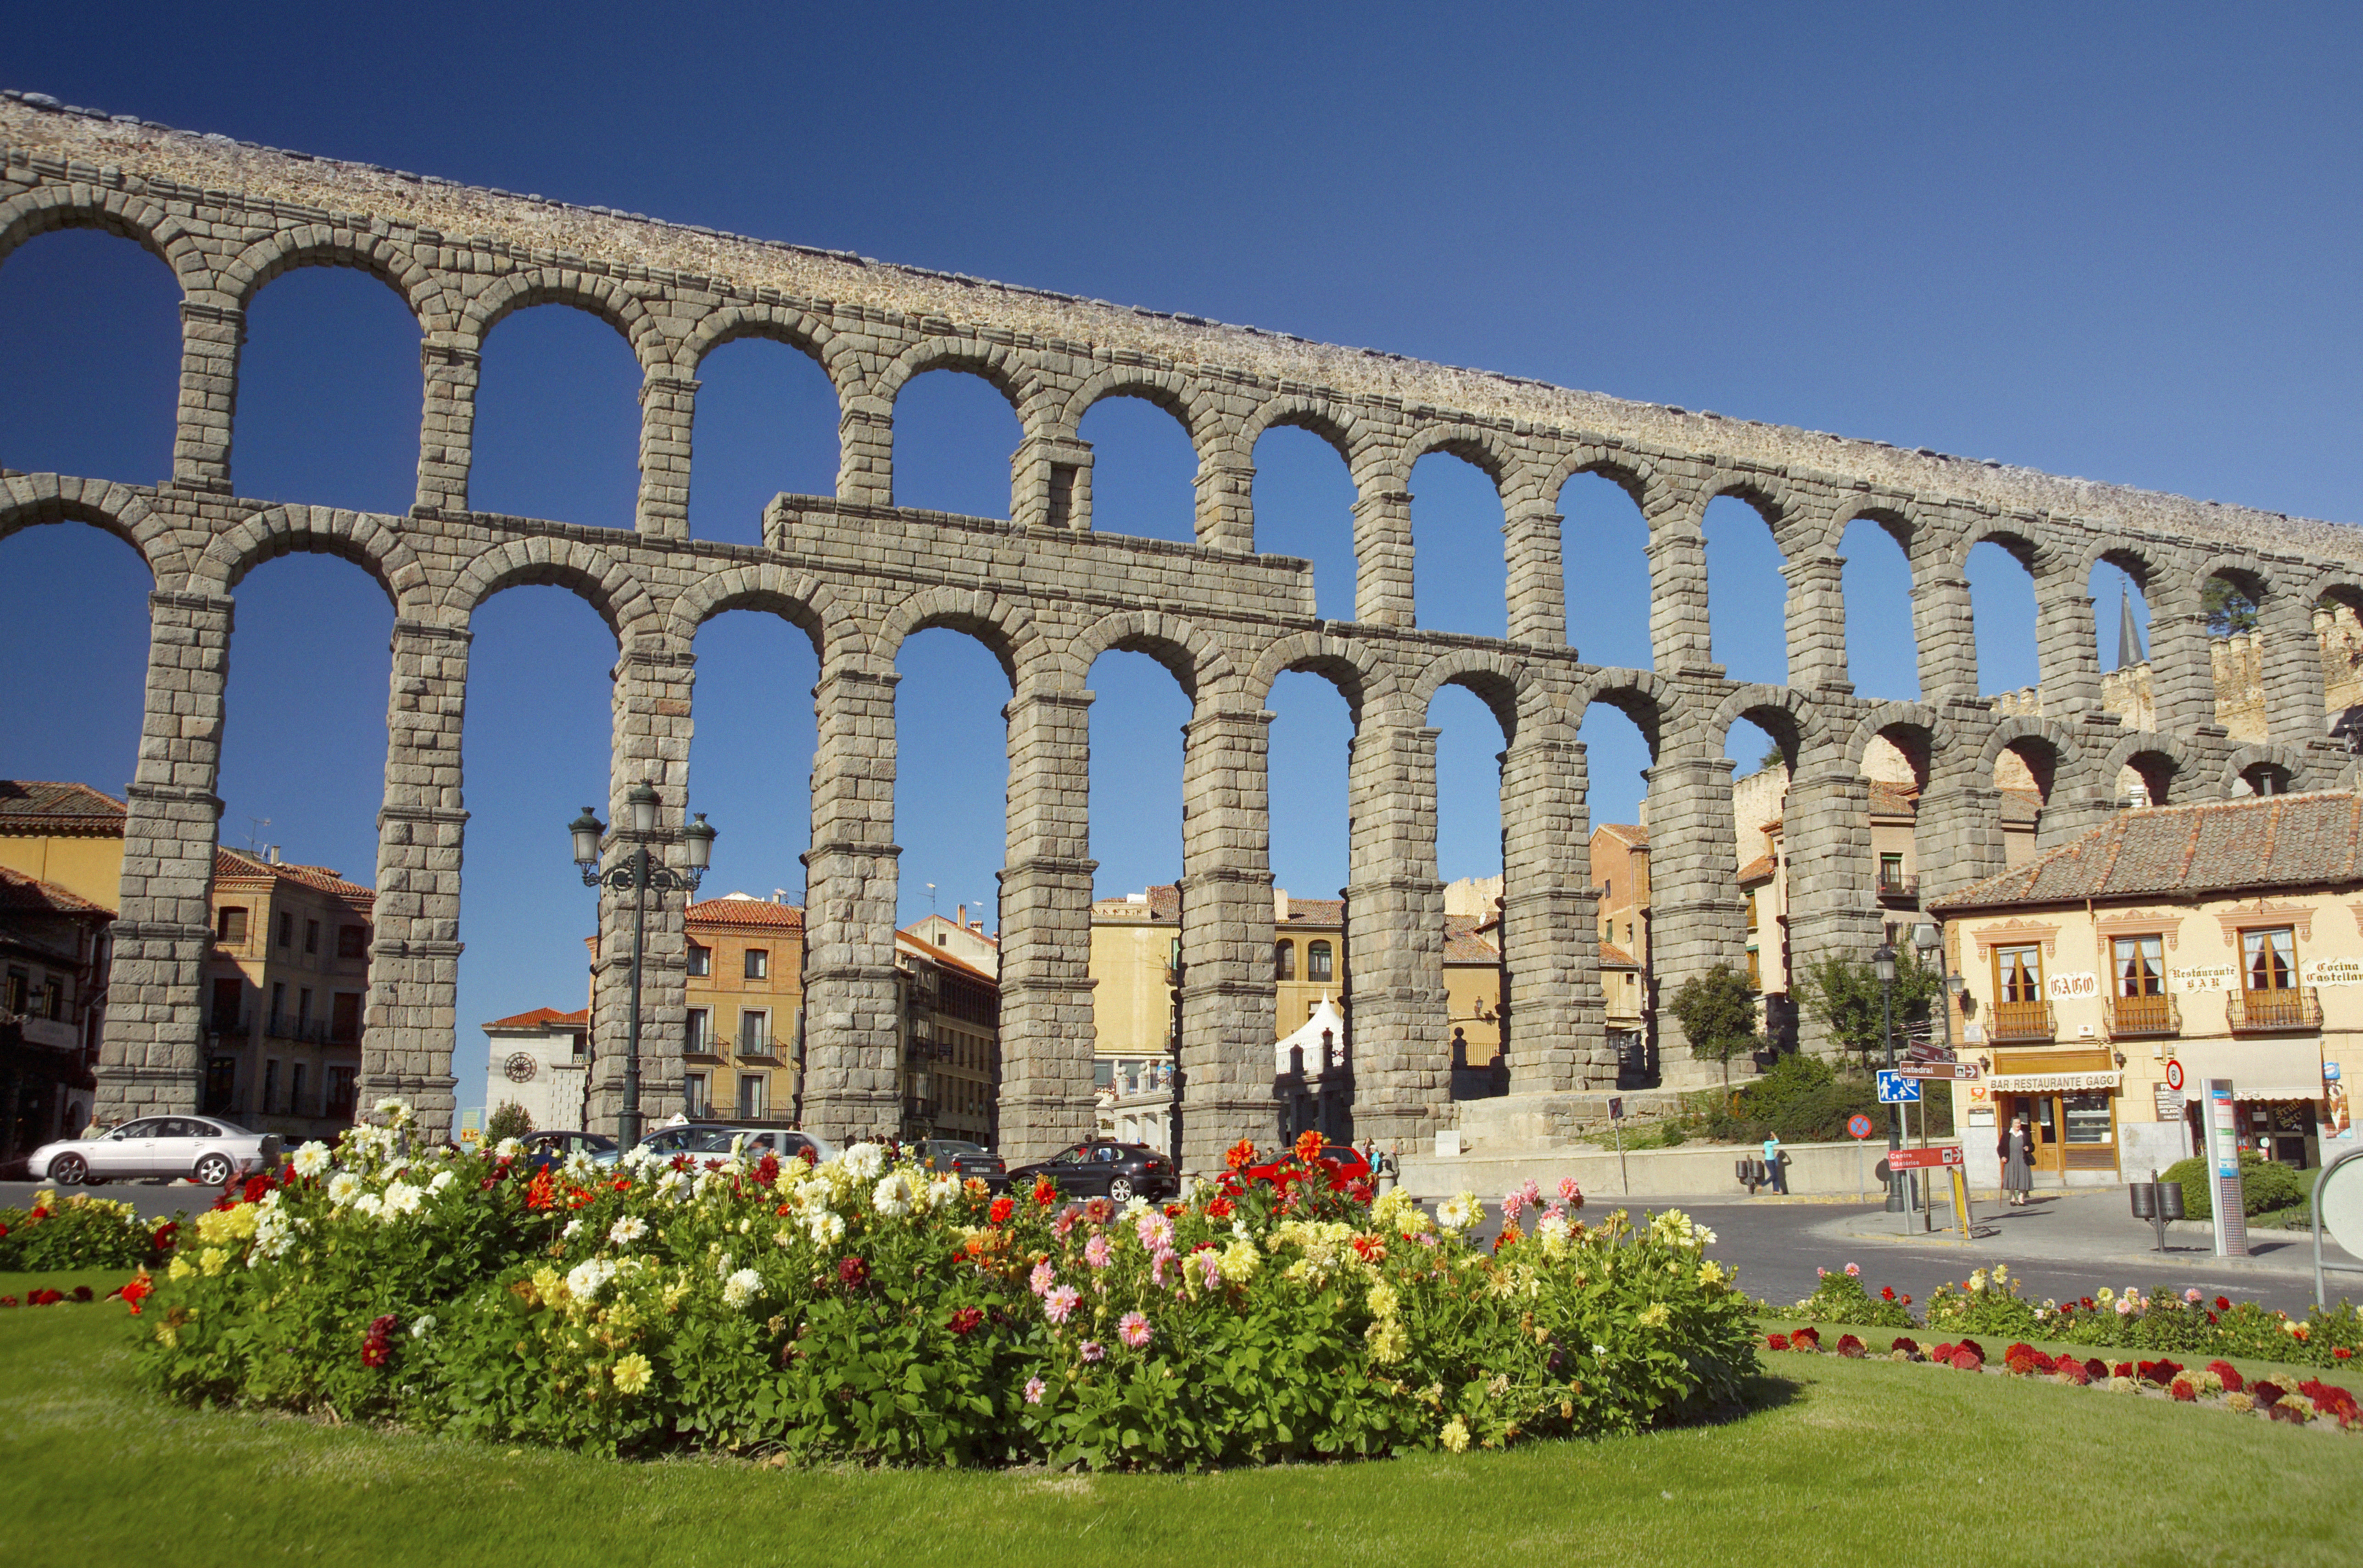 roman-aqueduct-segovia-spain - Roman Architecture and ...